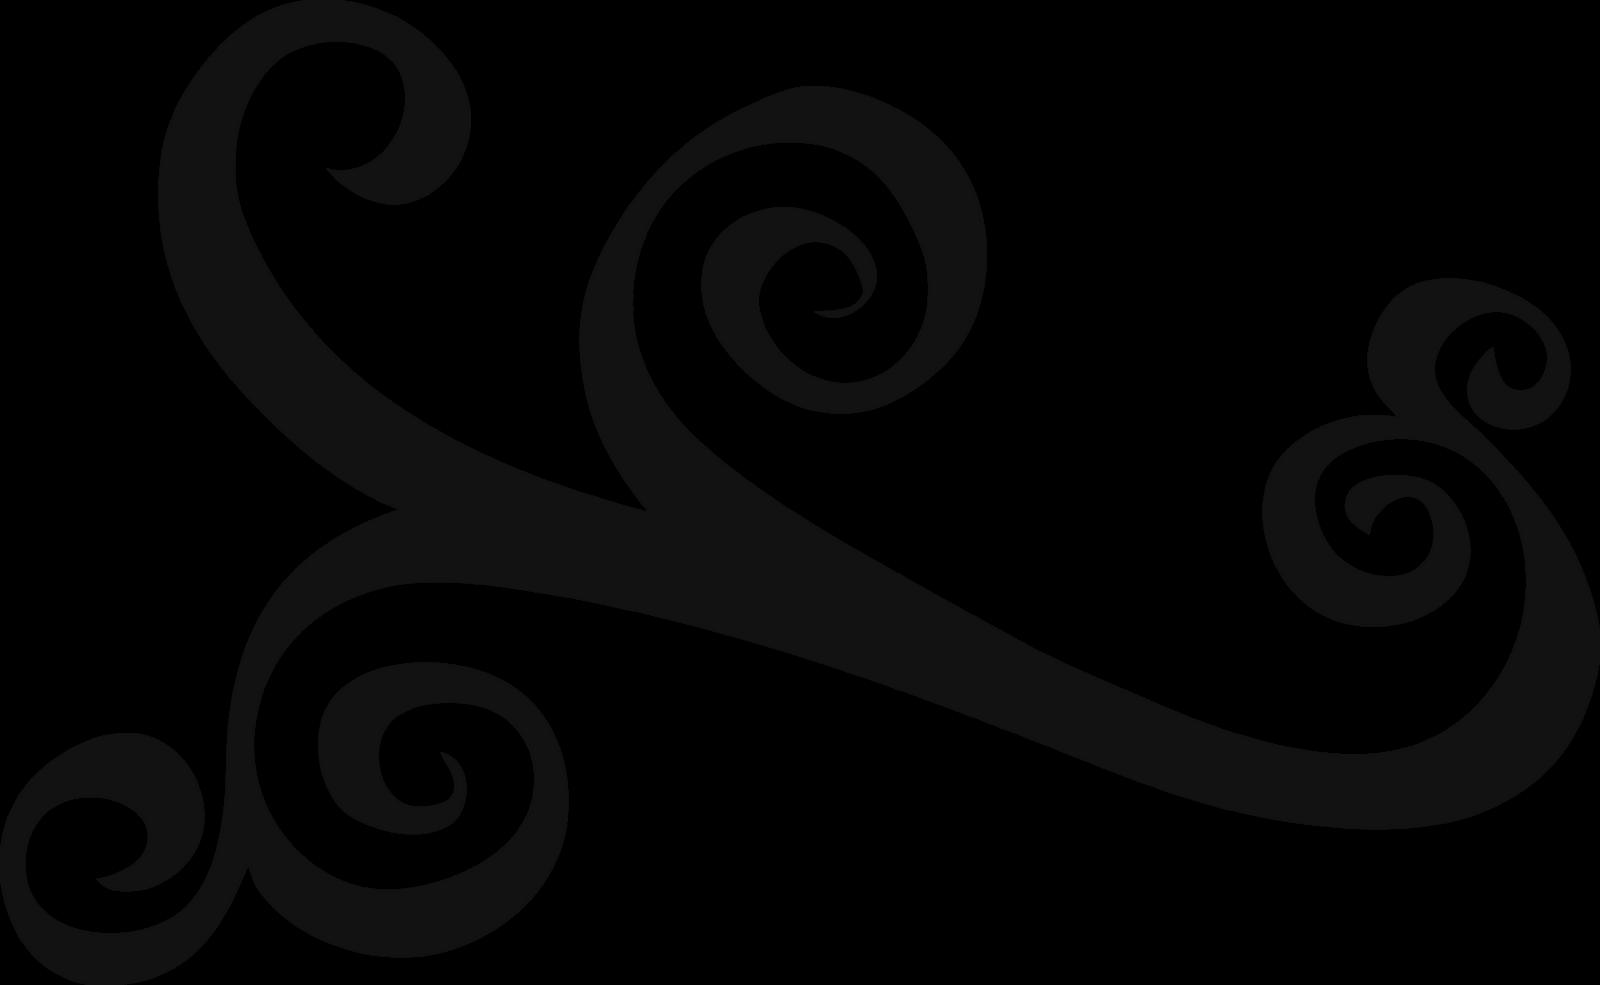 1600x985 Clip Art Line Design Clipart